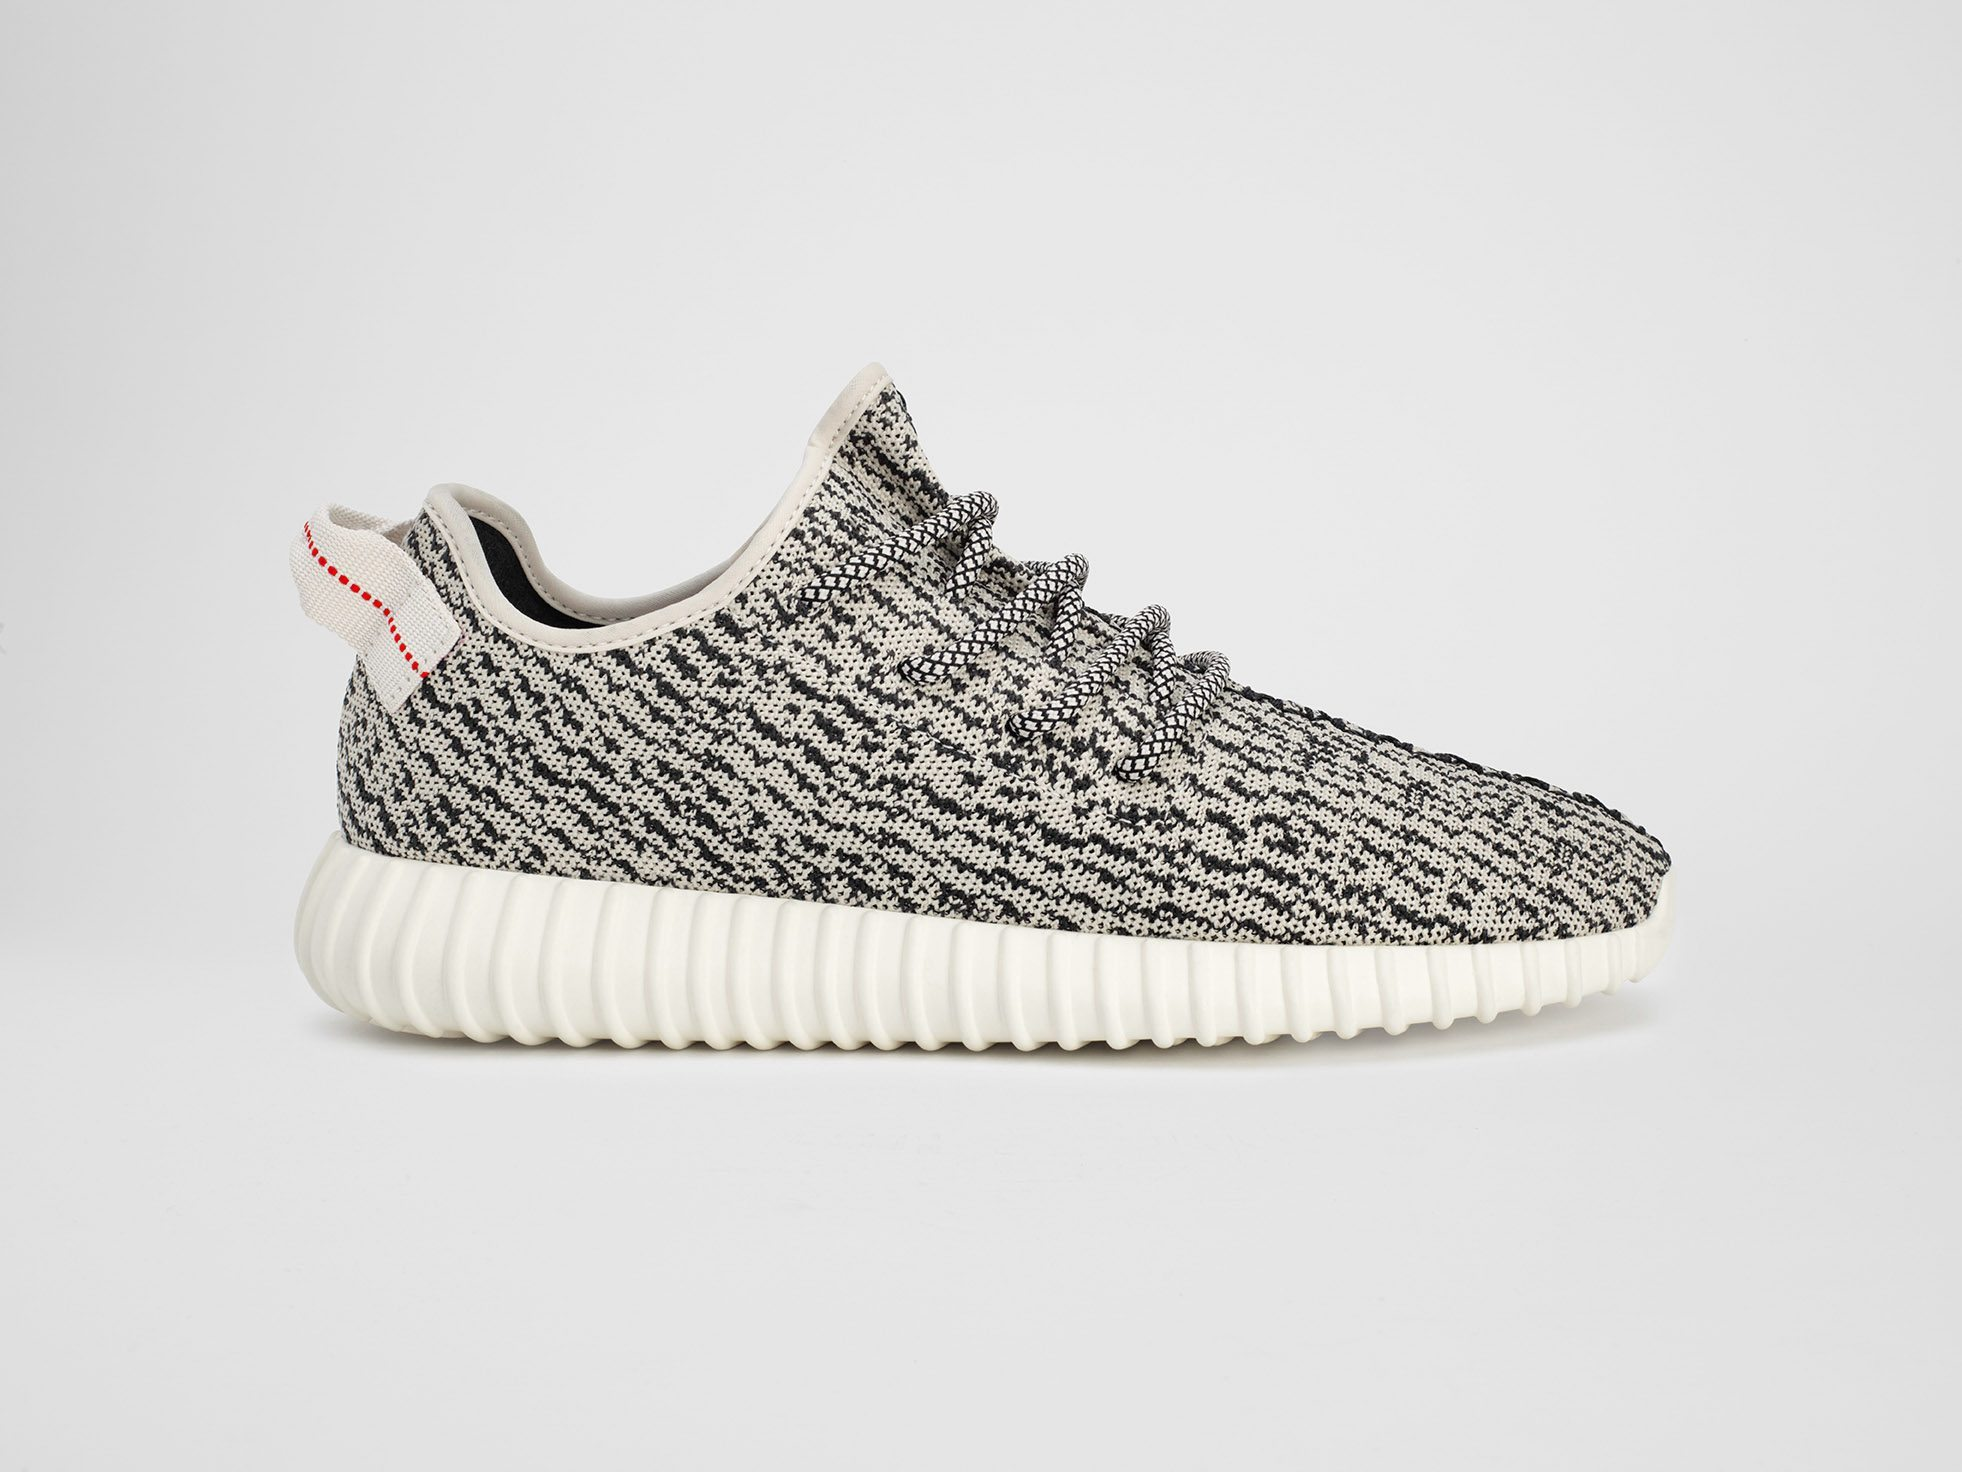 Kanye West x adidas Originals Yeezy Boost 350 1